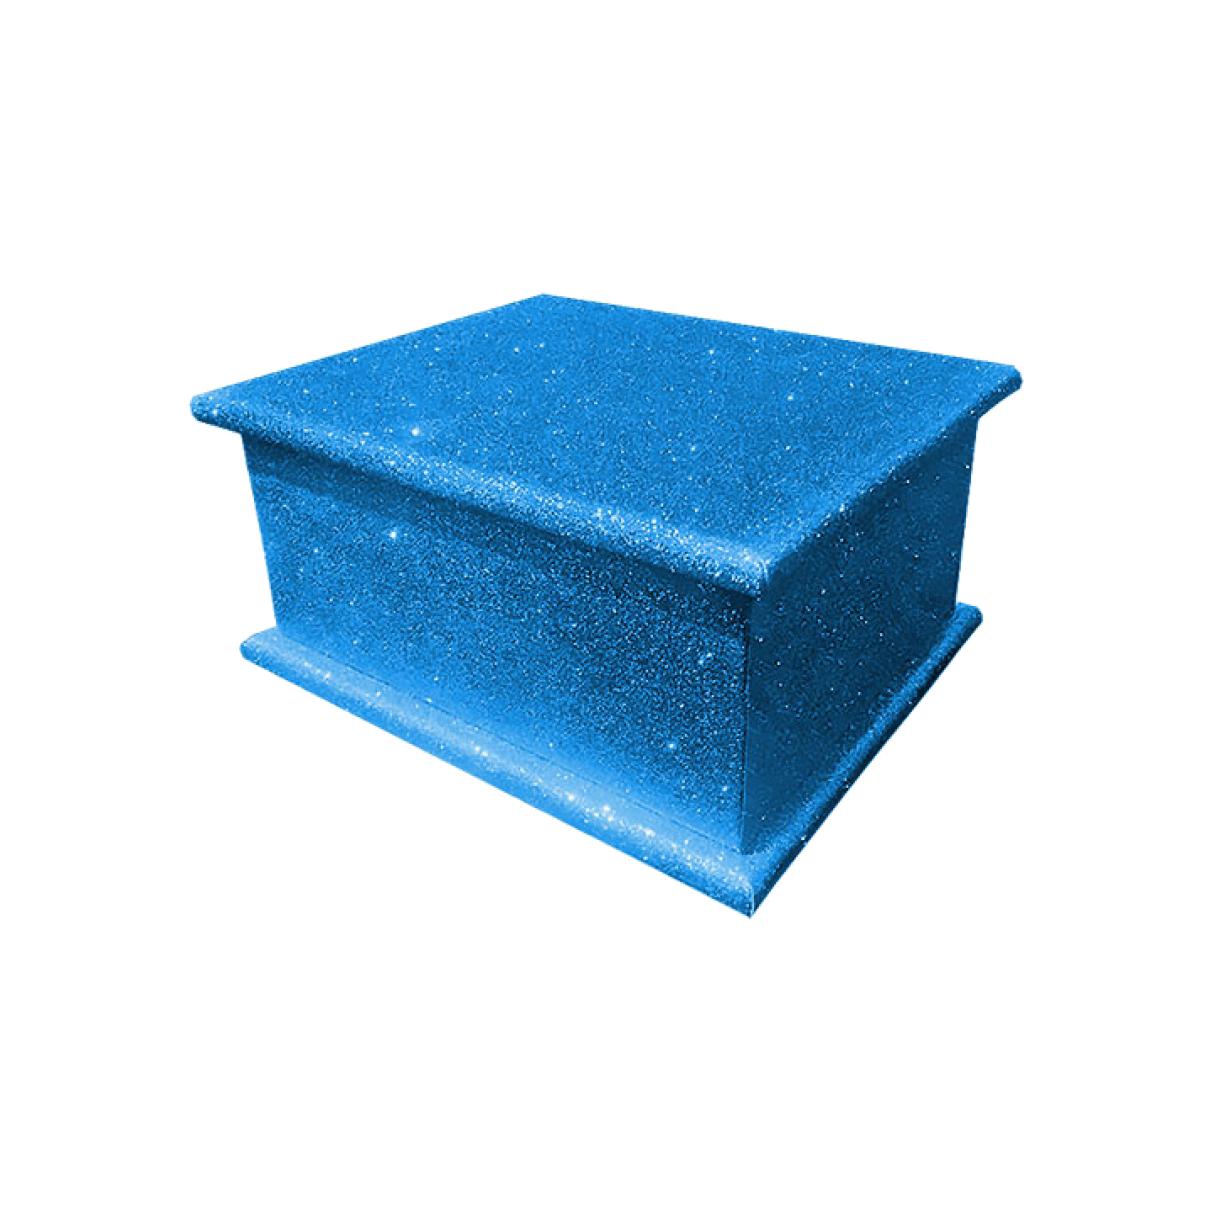 Glitter Adult Ashes Casket – Blue